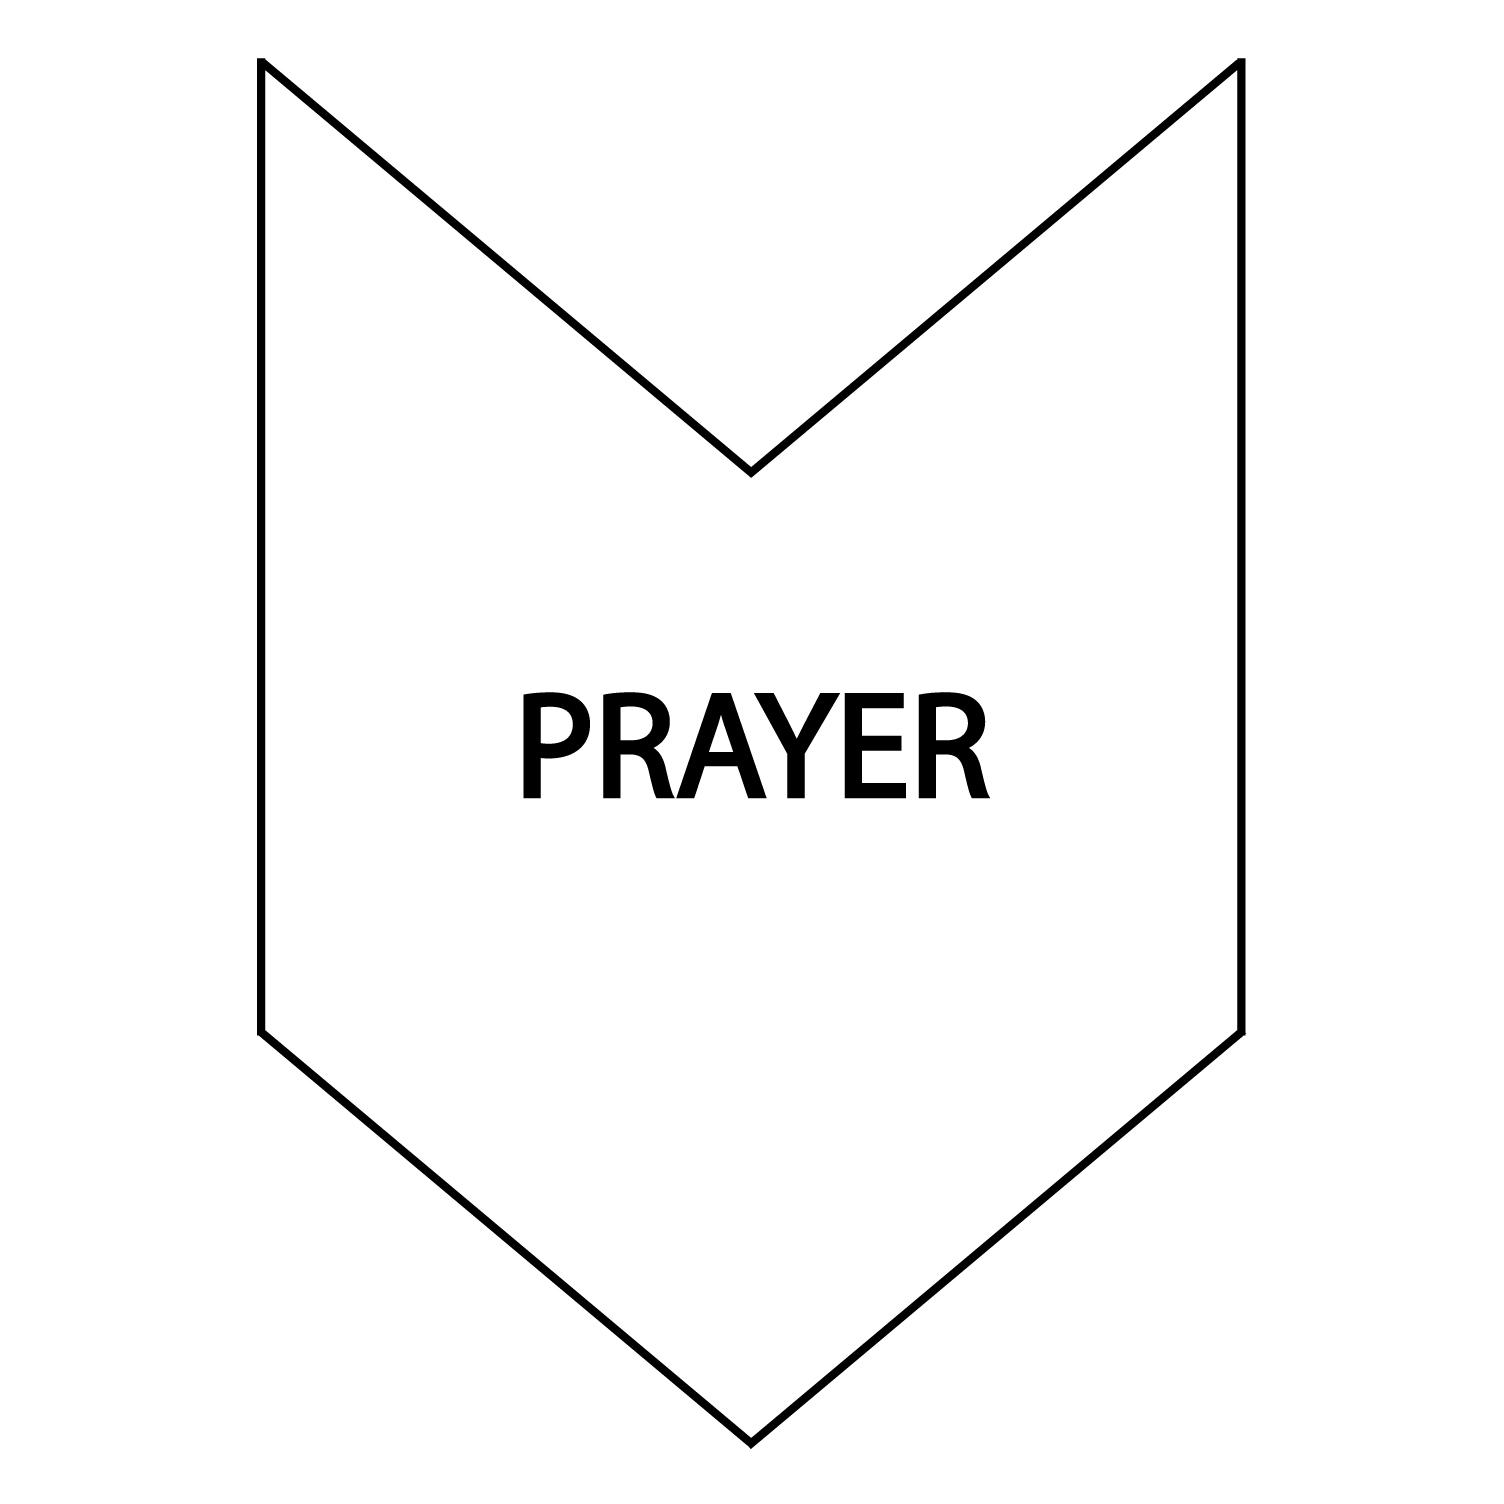 Prayer Arrow.jpg